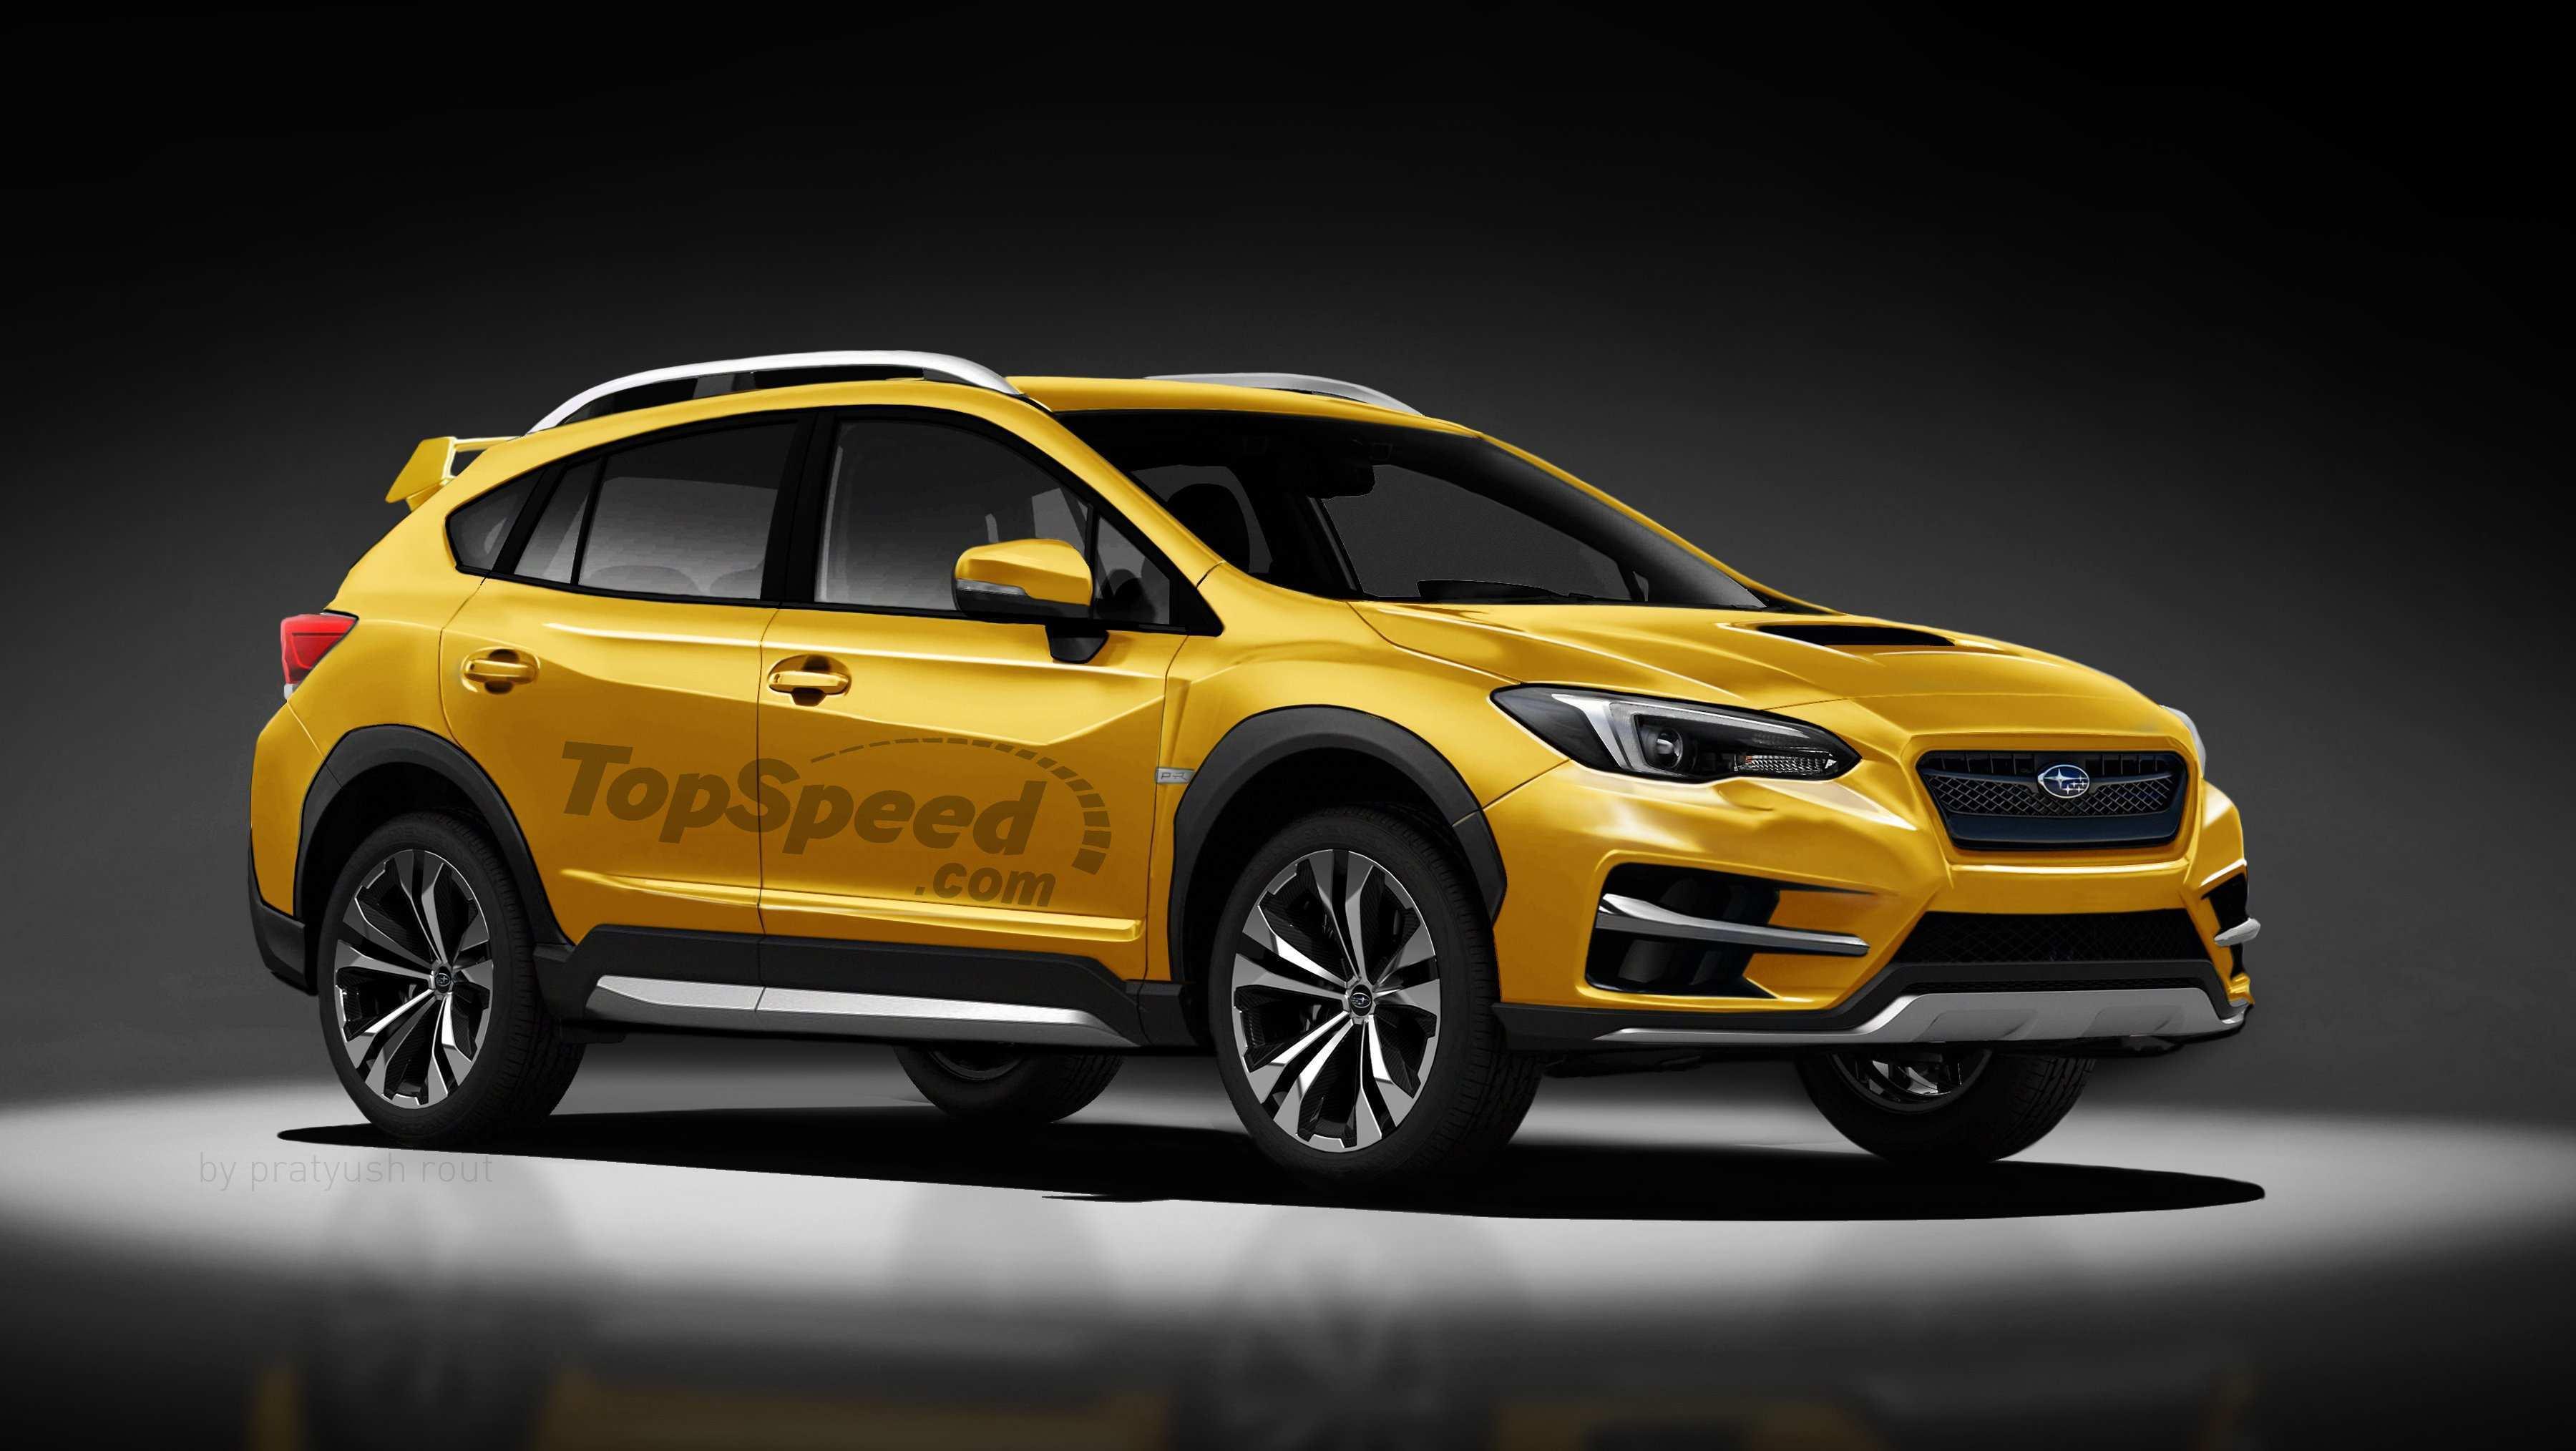 75 Great Subaru Sport 2020 Exterior and Interior with Subaru Sport 2020